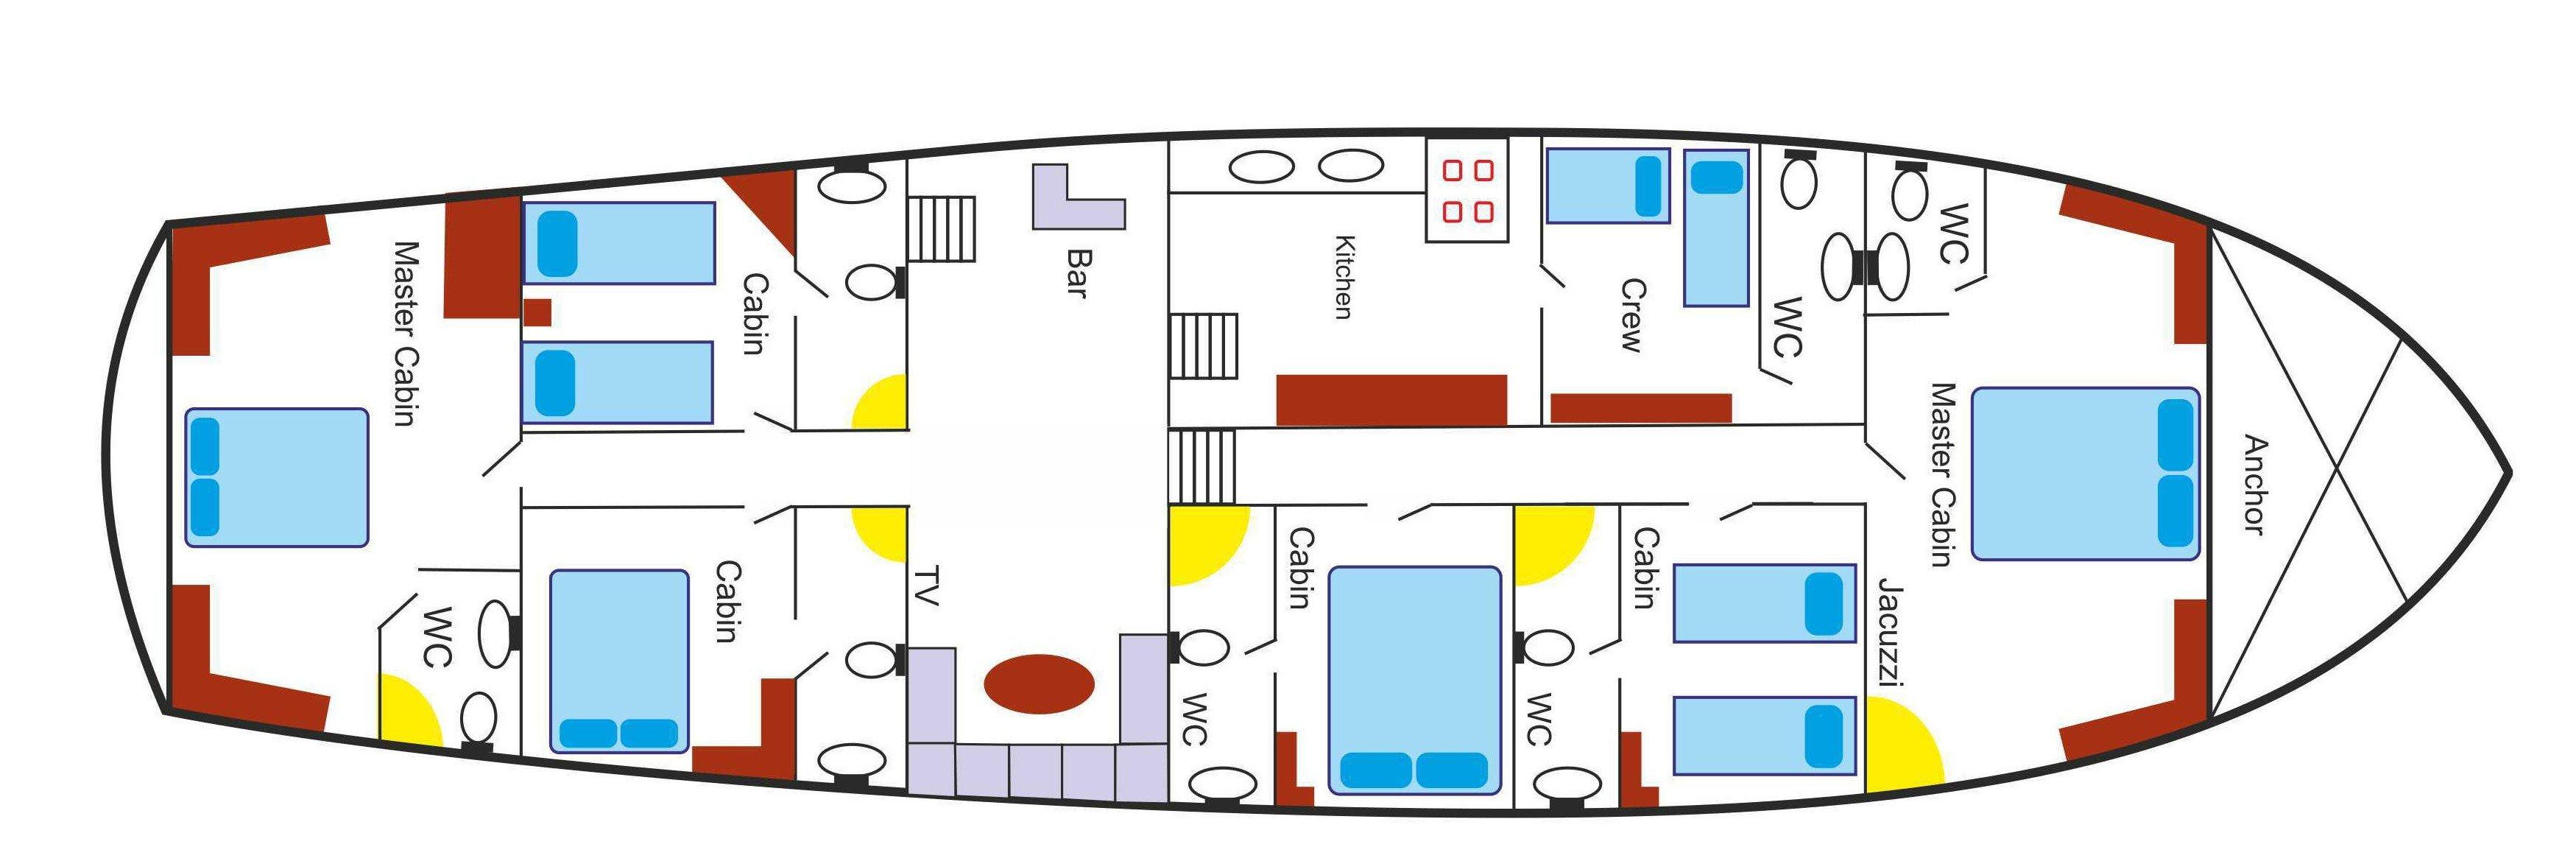 Perla Del Mar 2 plan 1